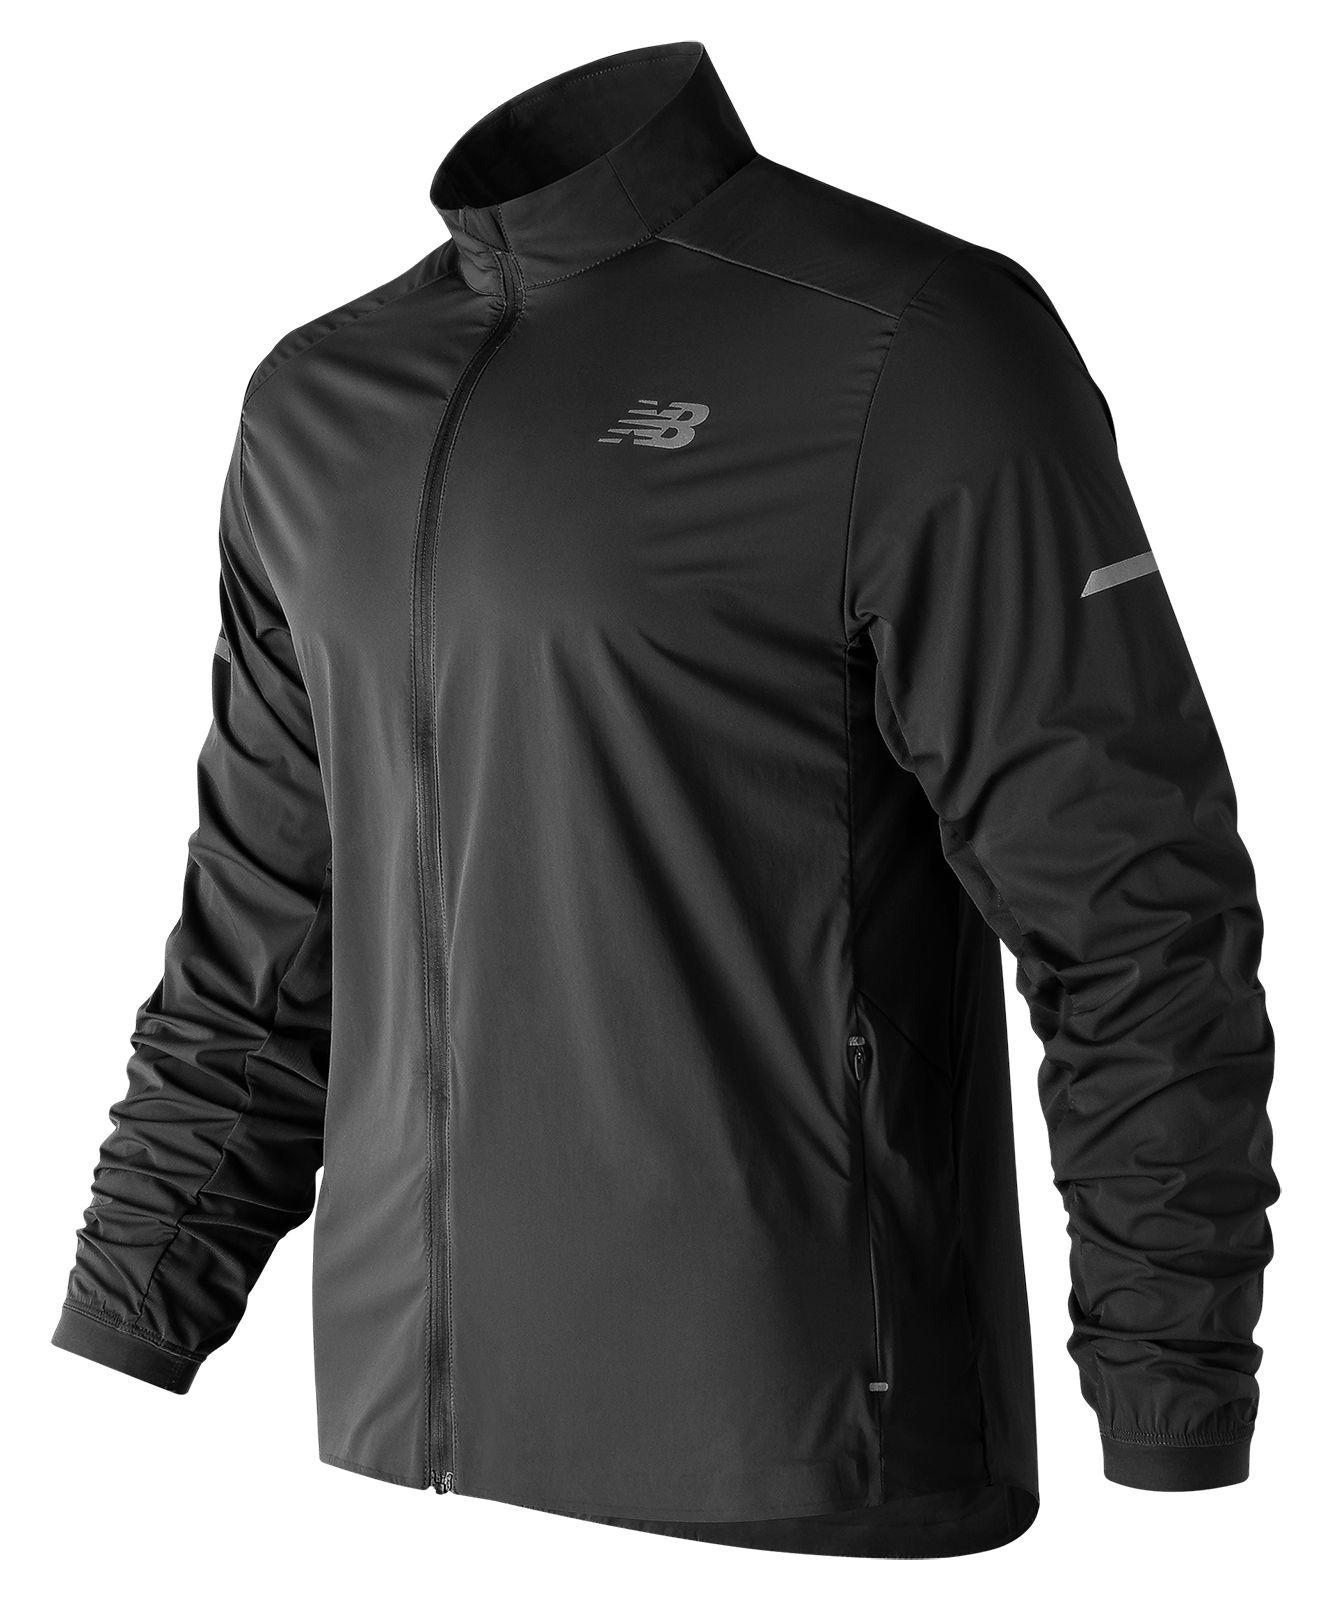 NB Speed Run Jacket, Black